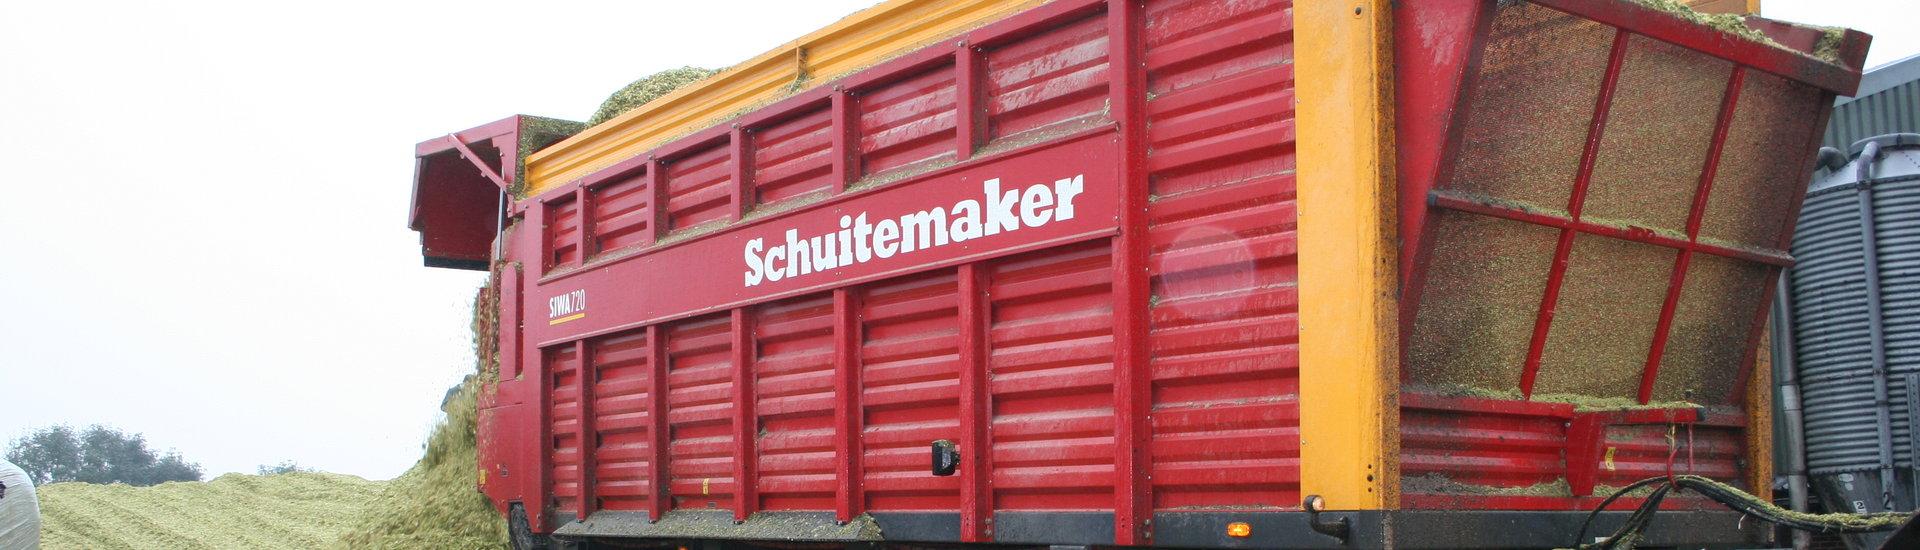 Schuitmaker silagewagon